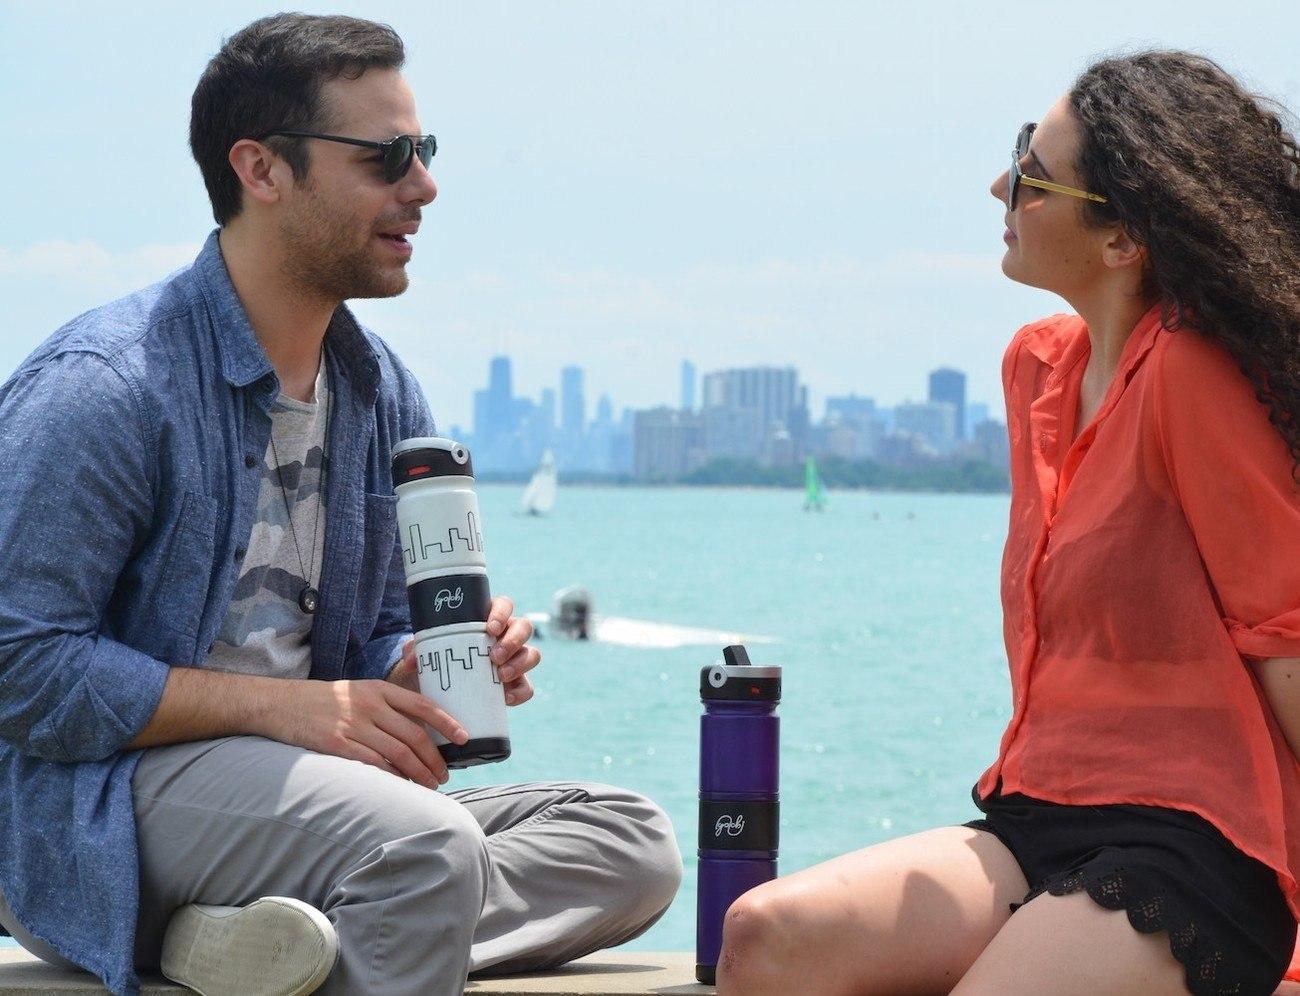 Golchi – Most Versatile & Customizable Bottle Ever